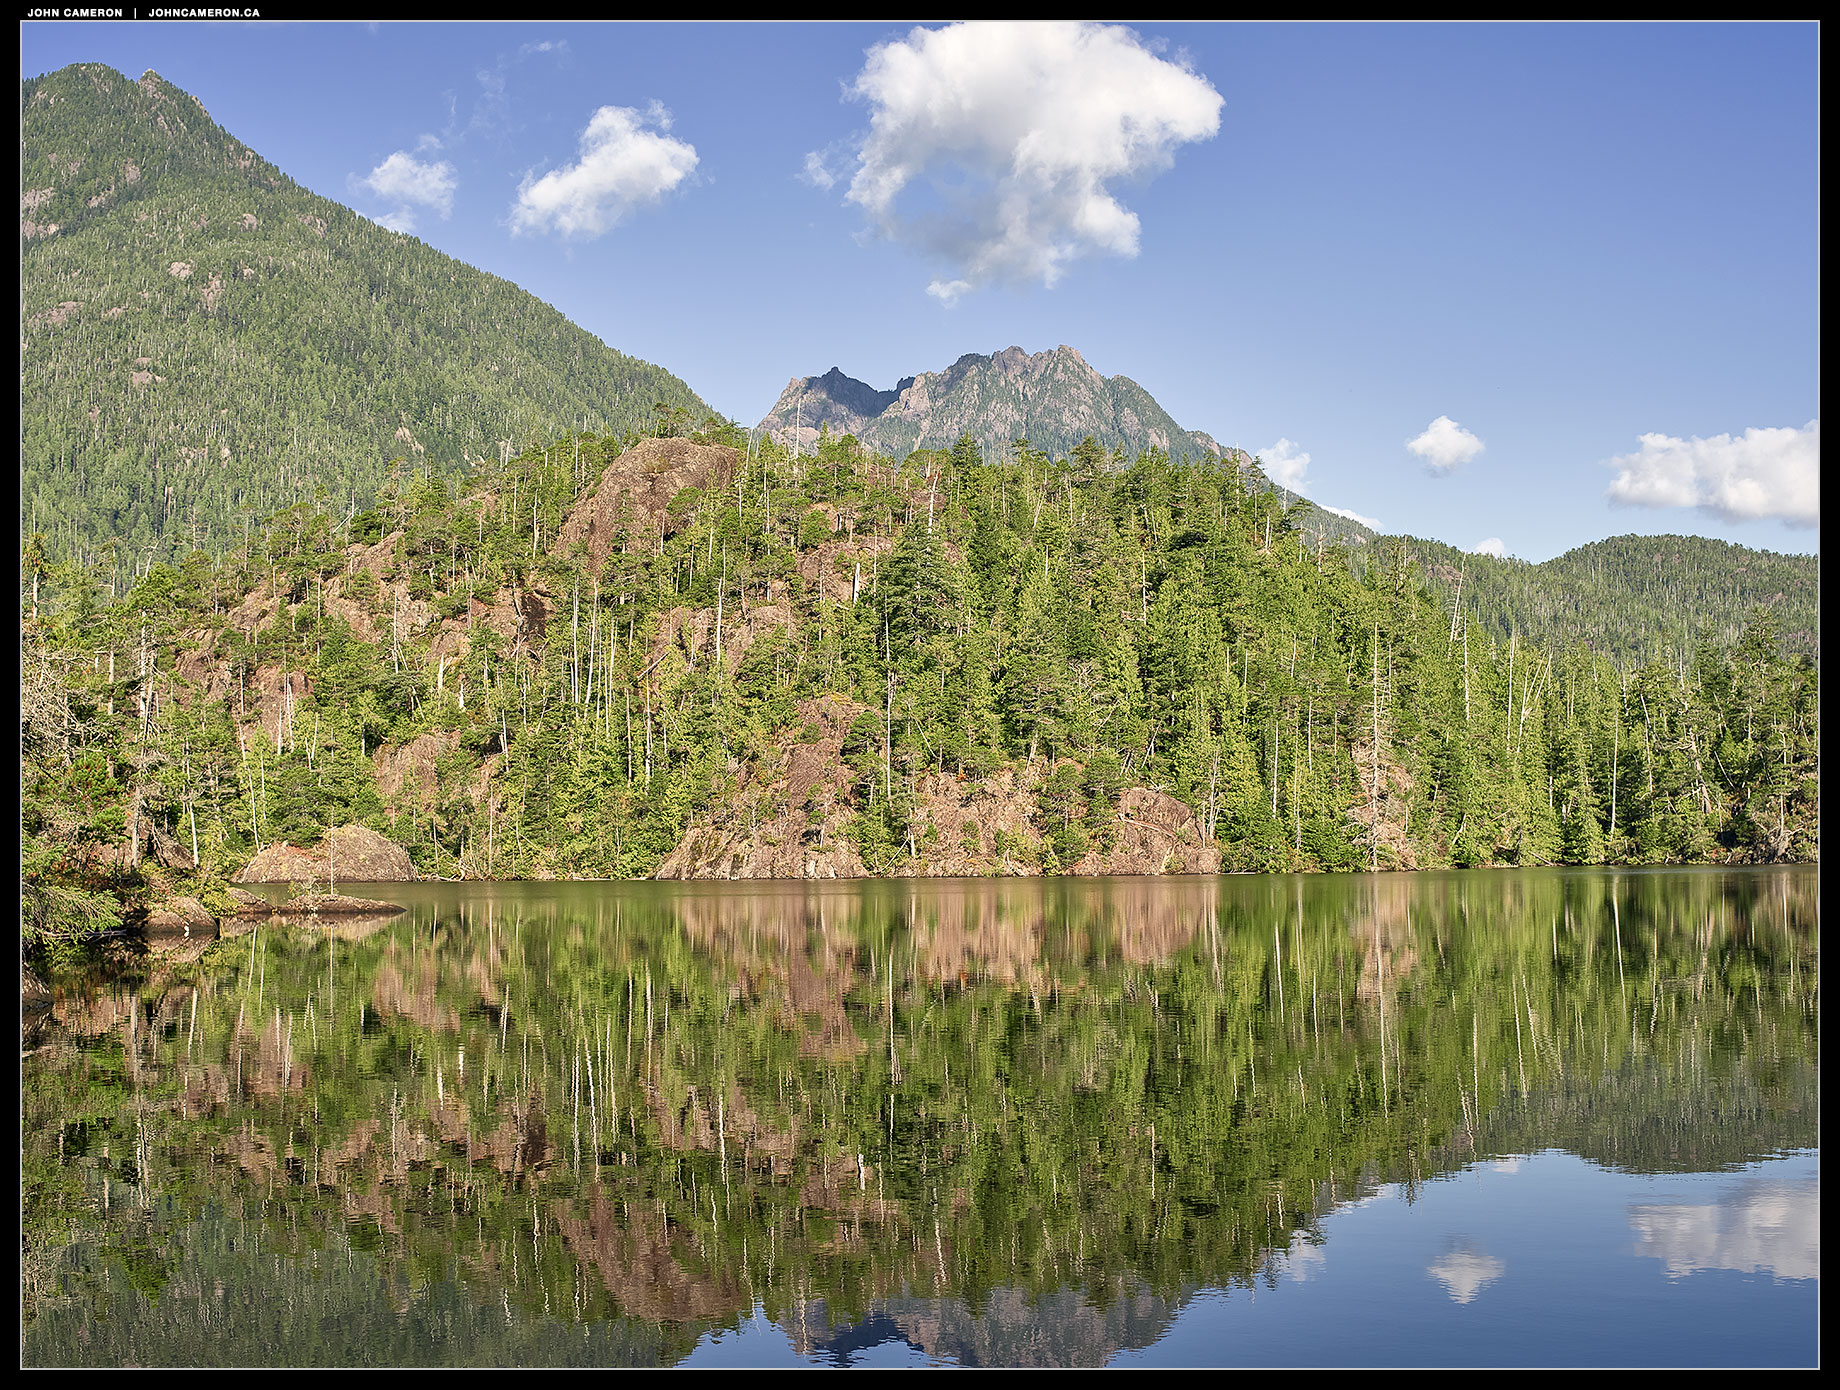 Larry Lake, Vancouver Island